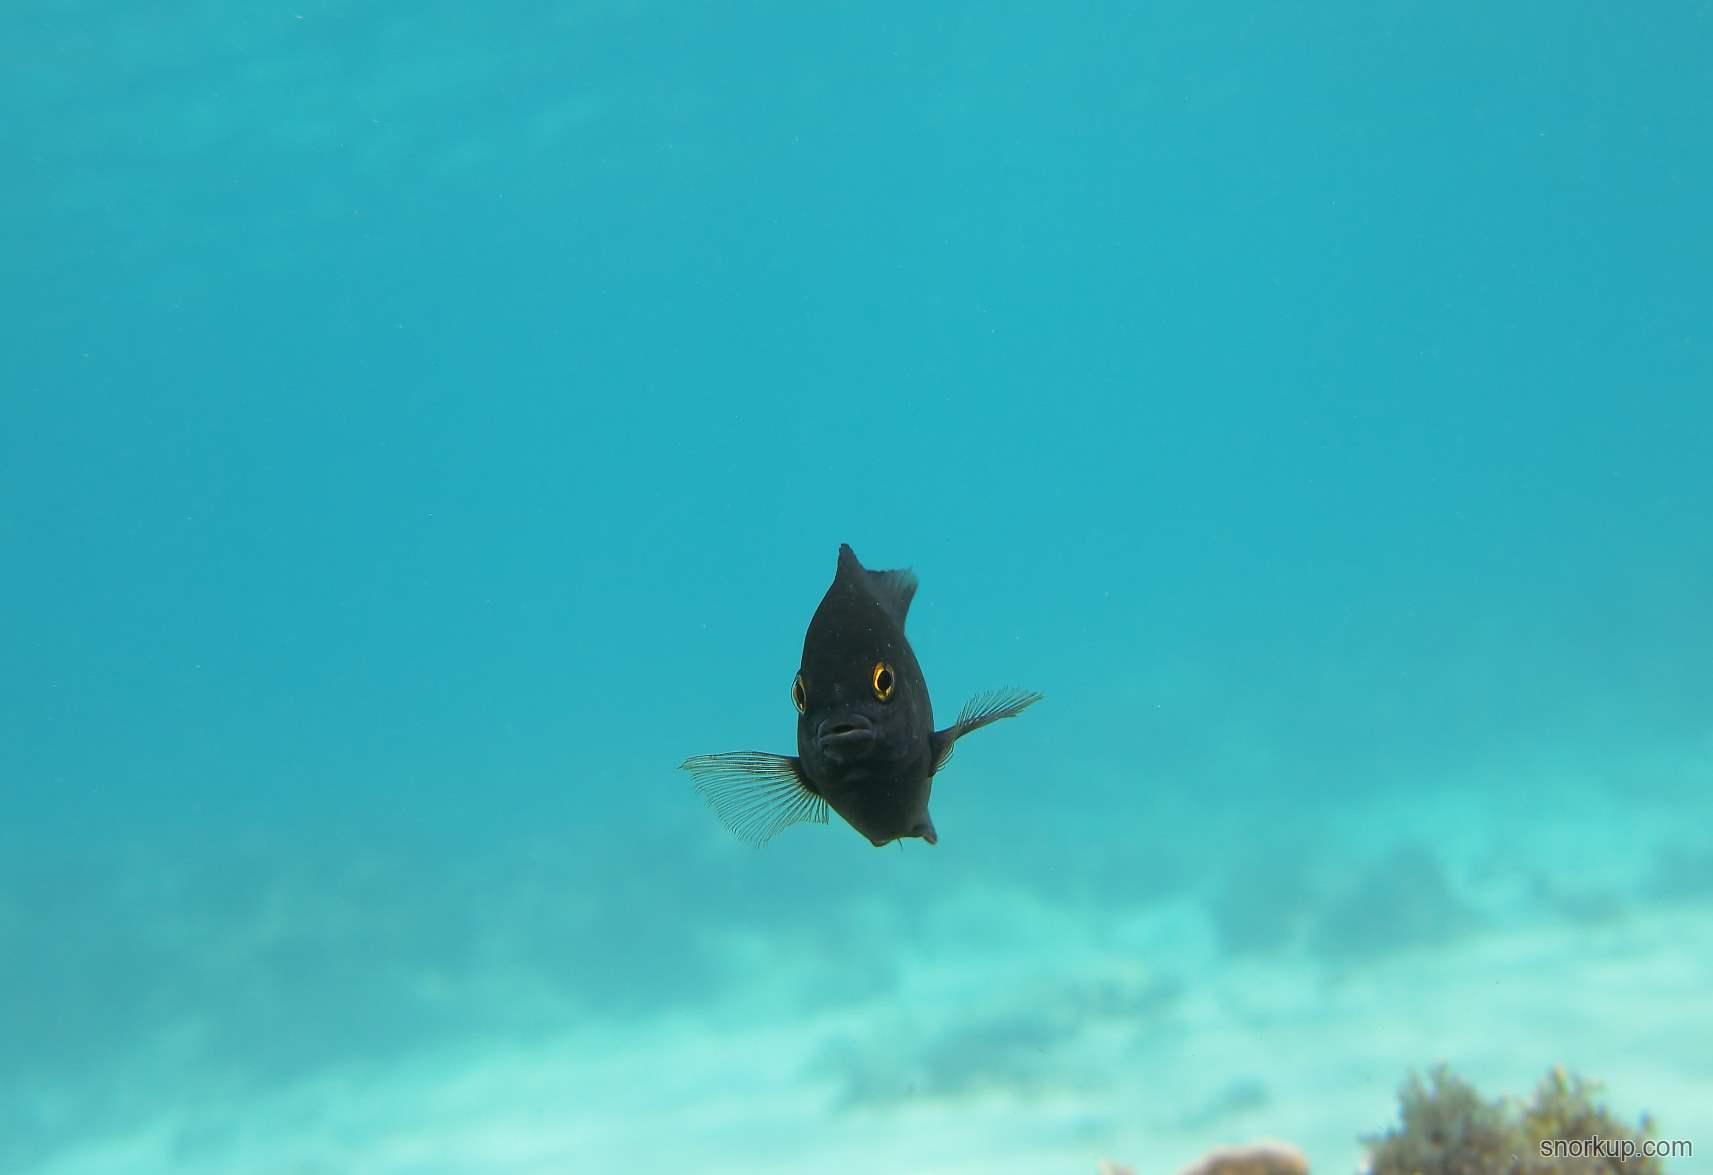 Микроспатодон желтохвостый или Помацентрус звездчатый, или Бриллиантовая девушка, лат.Microspathodon chrysurus, анг.Yellowtail damselfish